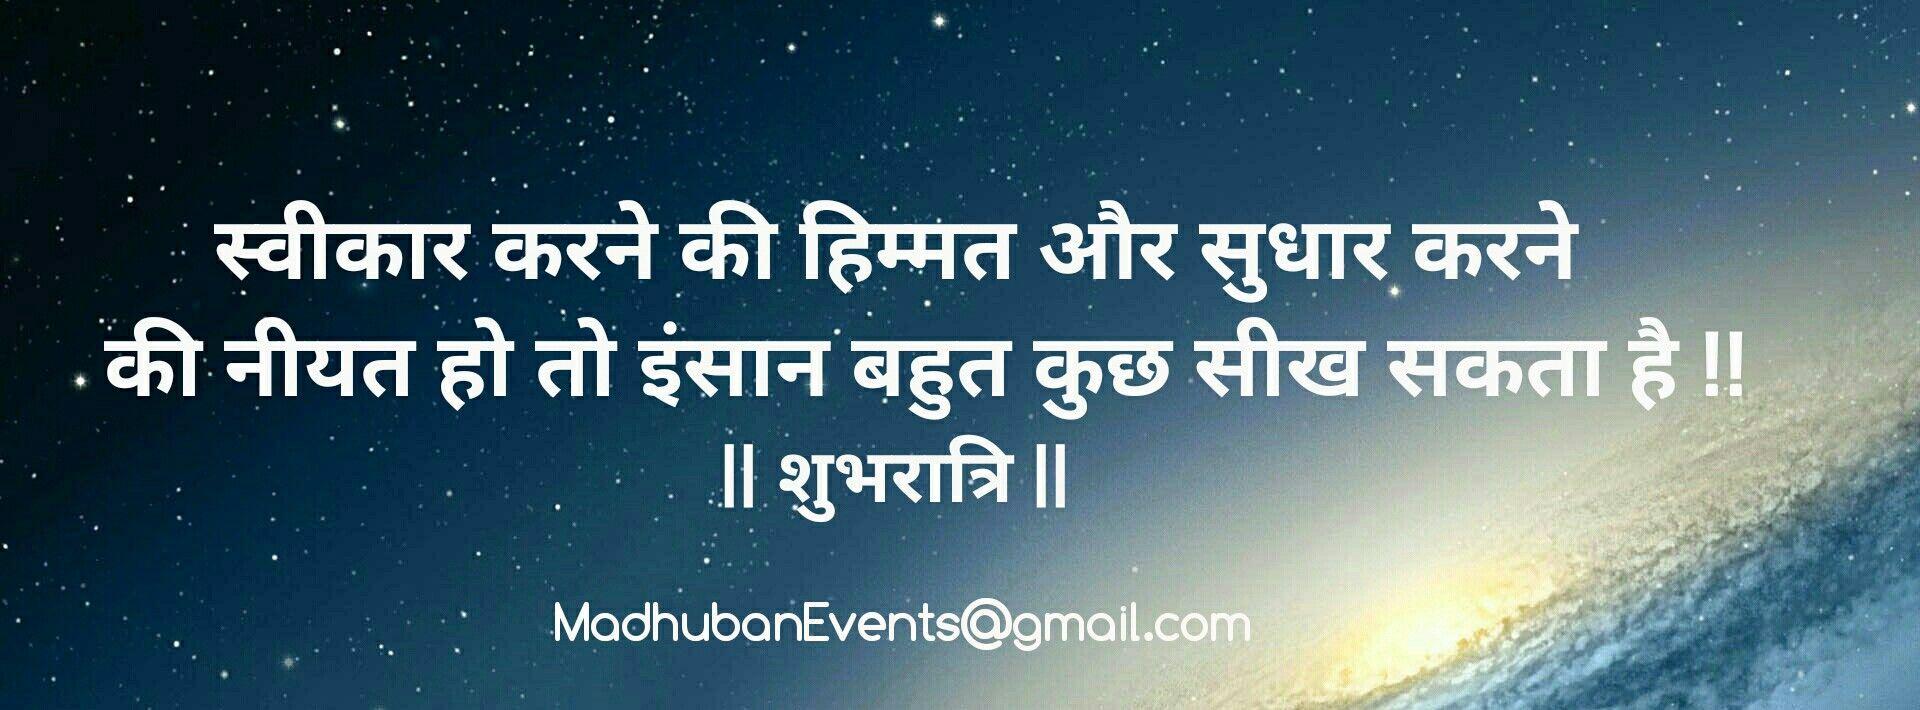 Good Night Quote Good Night Quote In Hindi सवकत करन